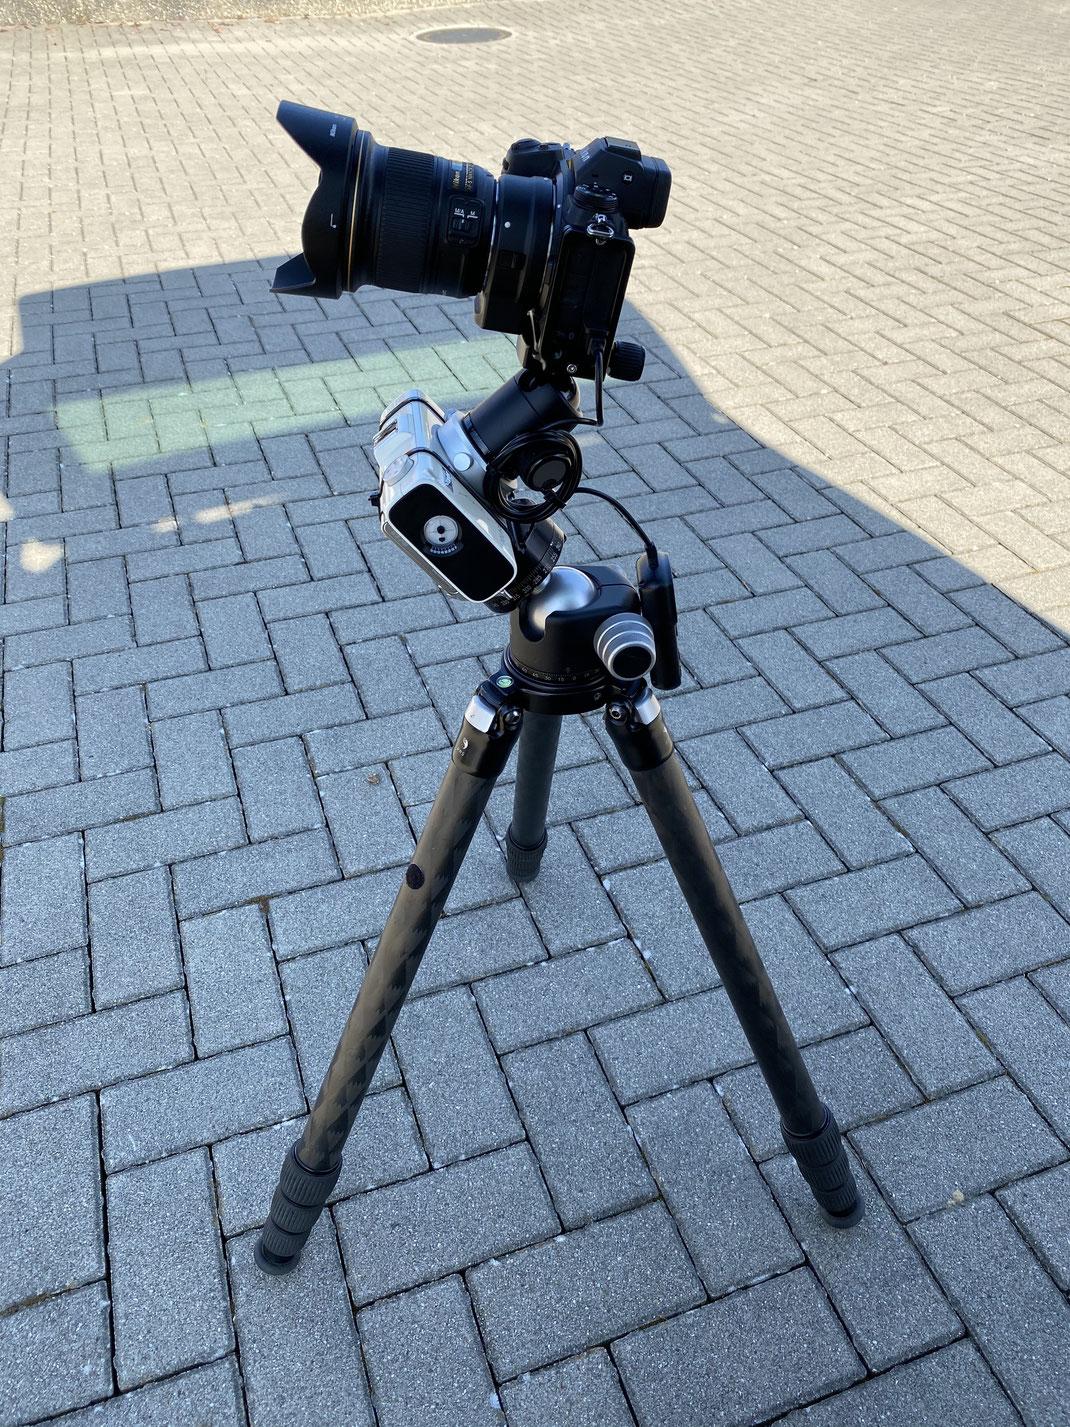 Bewährte Kombination - NikonZ7 + 20mm F/1.8 auf dem Polarie